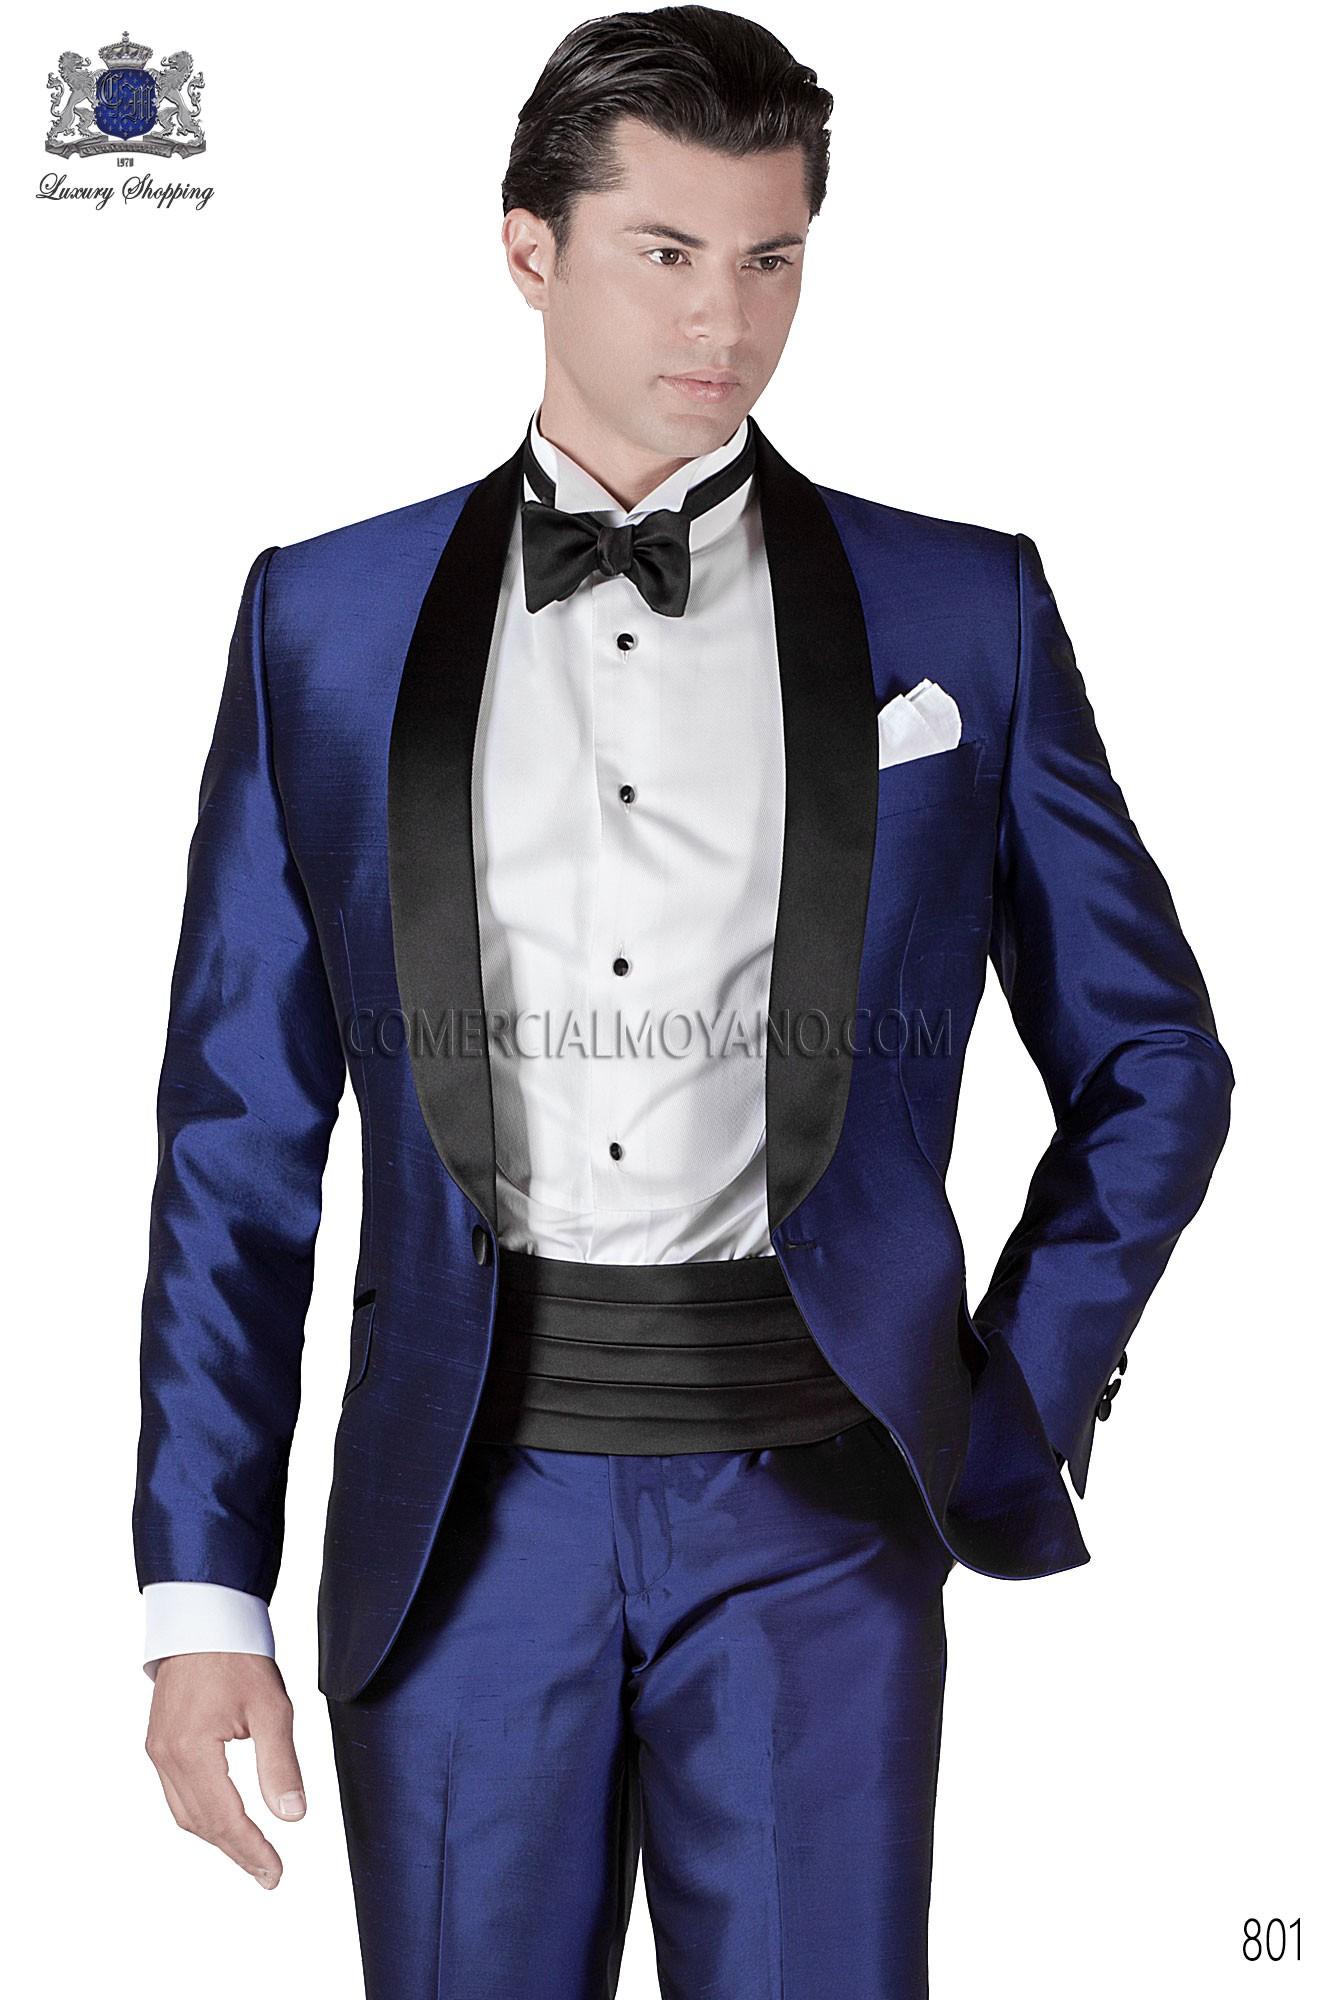 Italian bespoke royal blue tuxedo suit style 801 Ottavio Nuccio Gala.